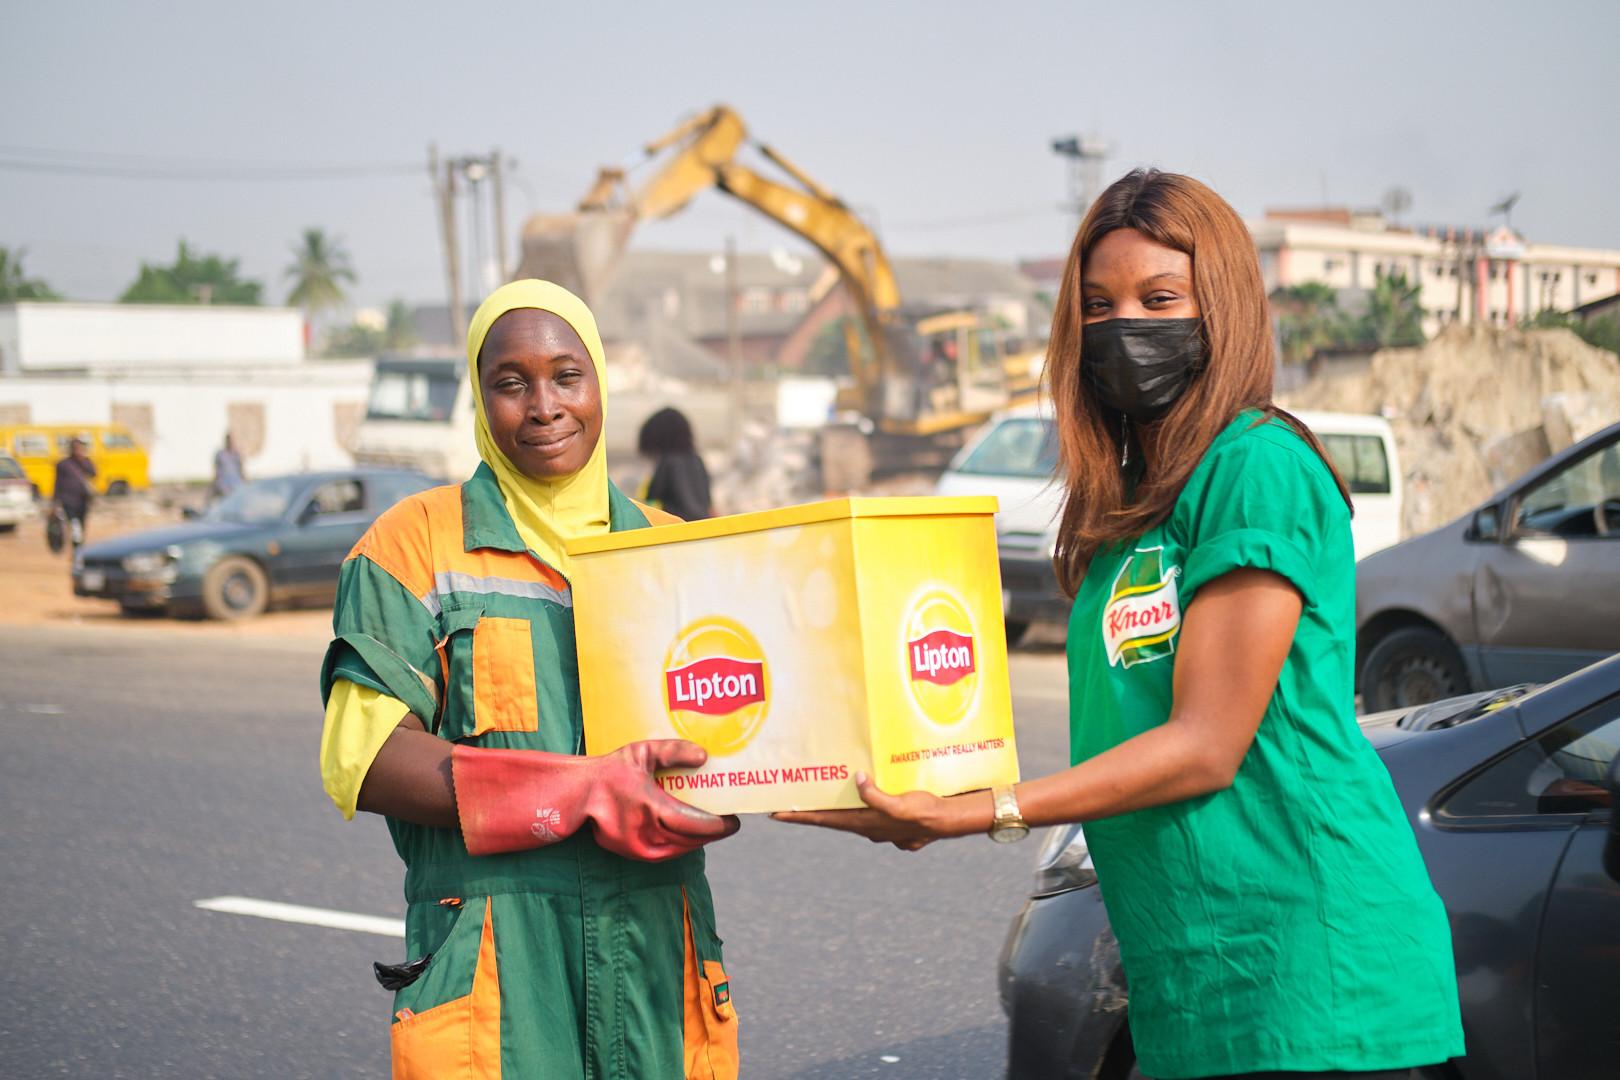 #seasonofthanks: Lipton and Knorr surprise Nigerians working through the holidays